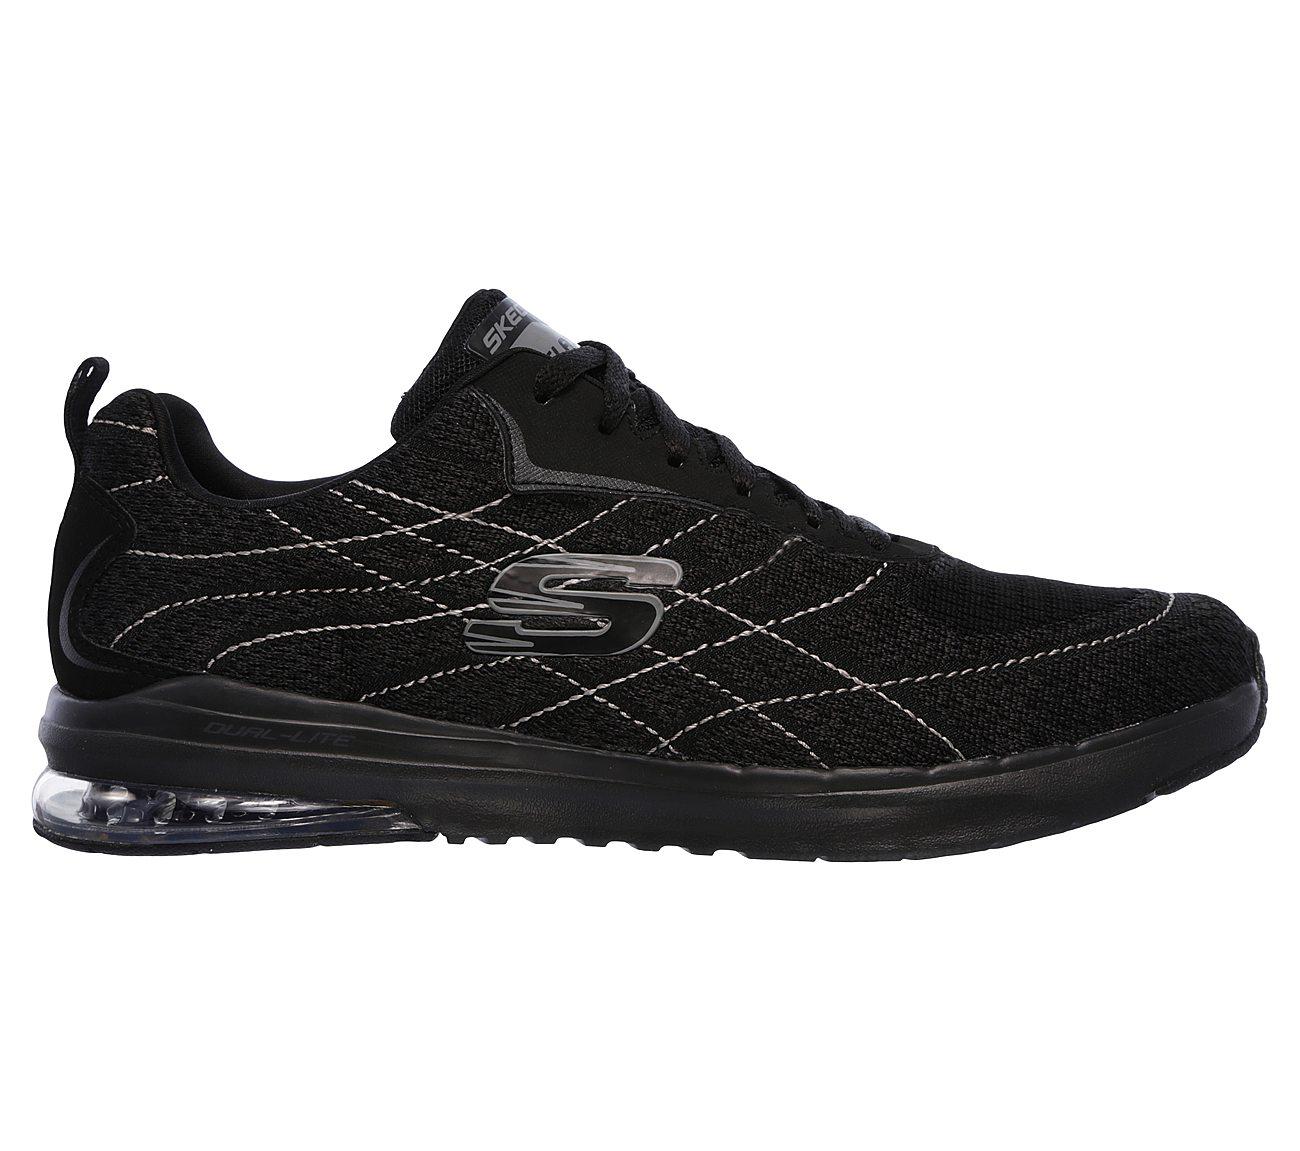 اسکچرز/مردانه/کفش اسکچرز مردانه  RELAXED FIT: SKECH-AIR INFINITY - BELDEN 51485